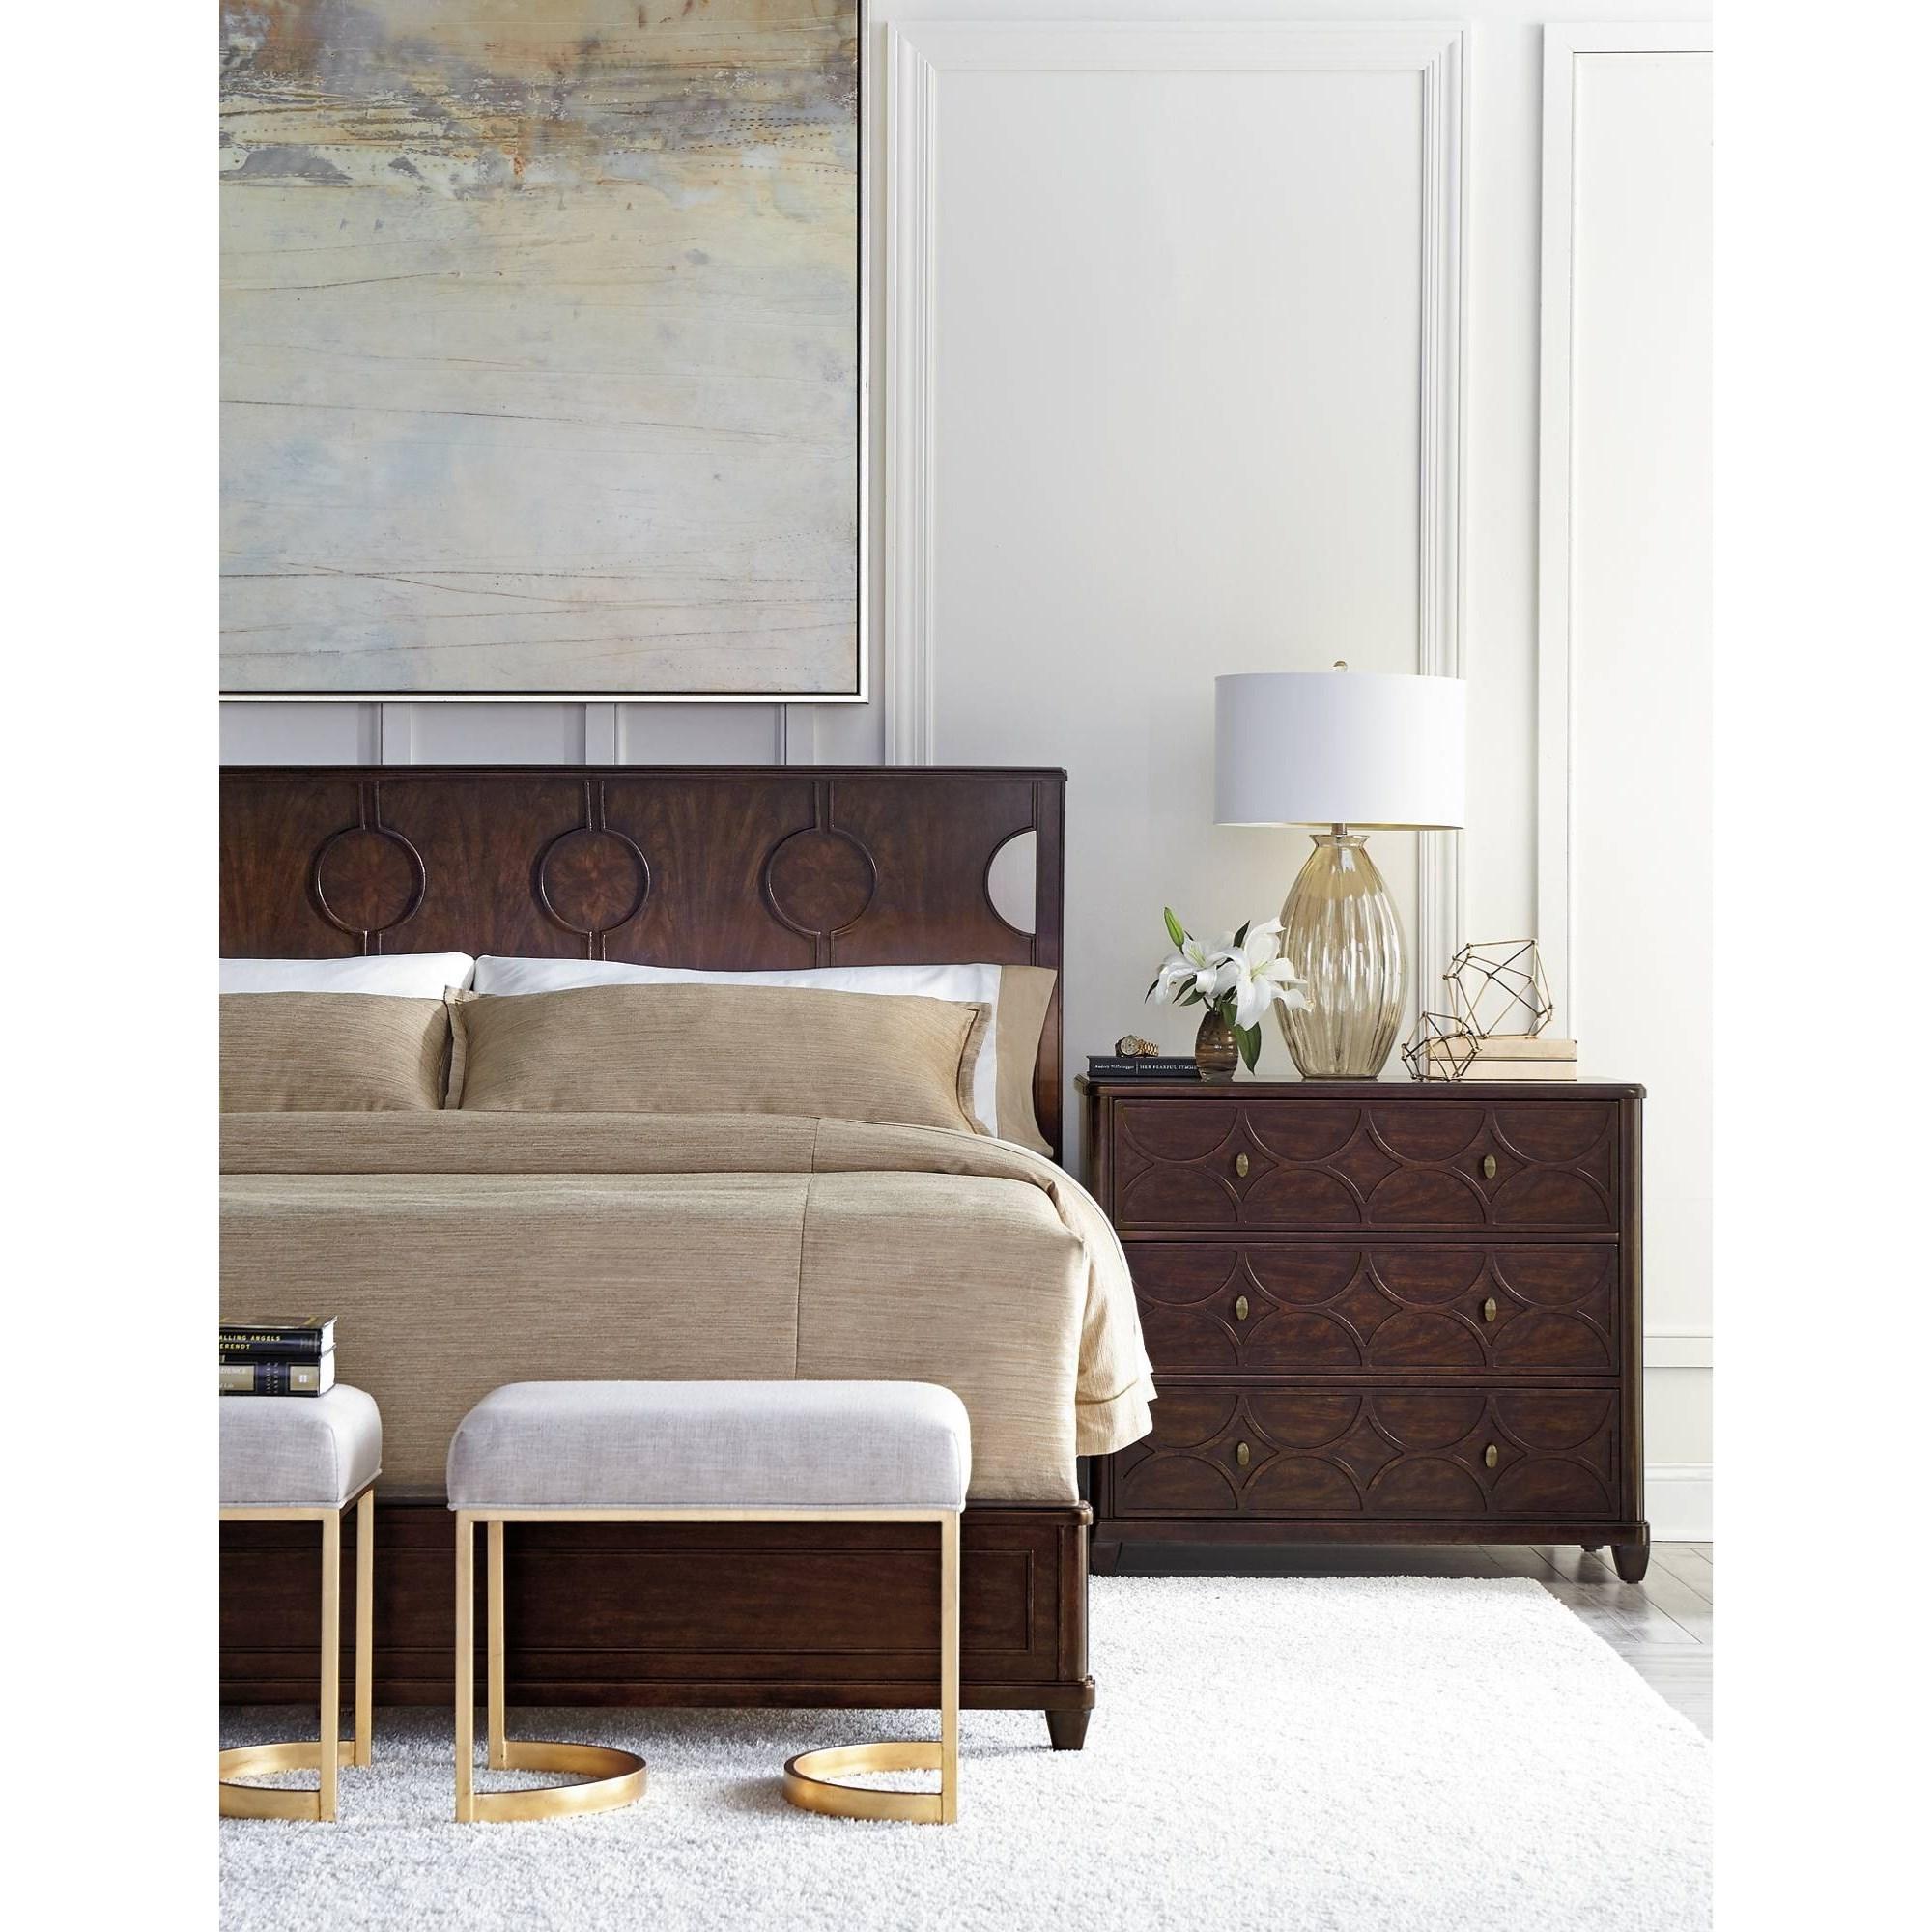 stanley furniture virage king bedroom group belfort